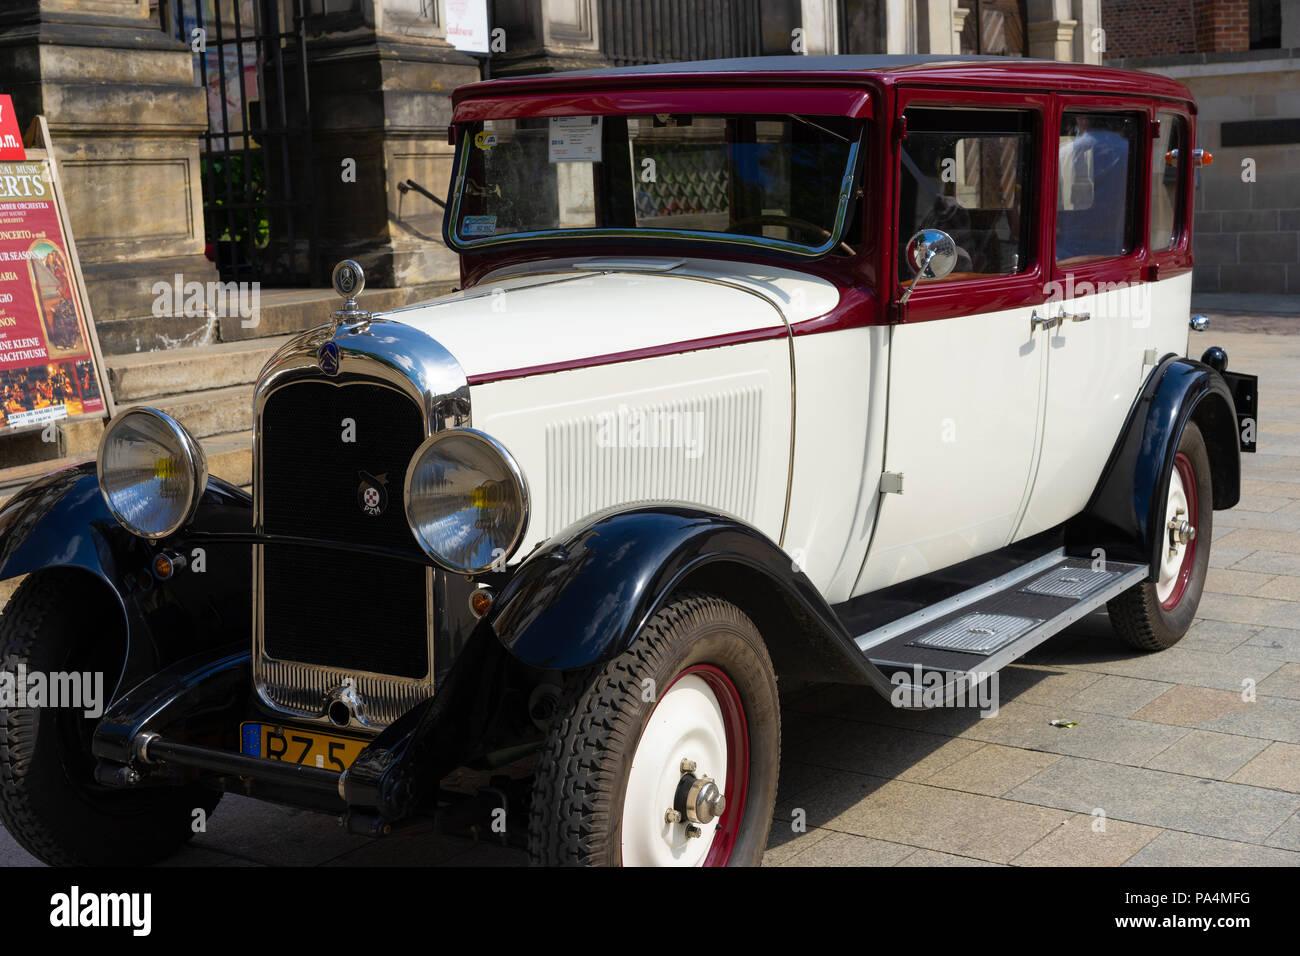 A renovated  1930 Citroen C4 Familiale in Krakow, Poland, Europe. - Stock Image